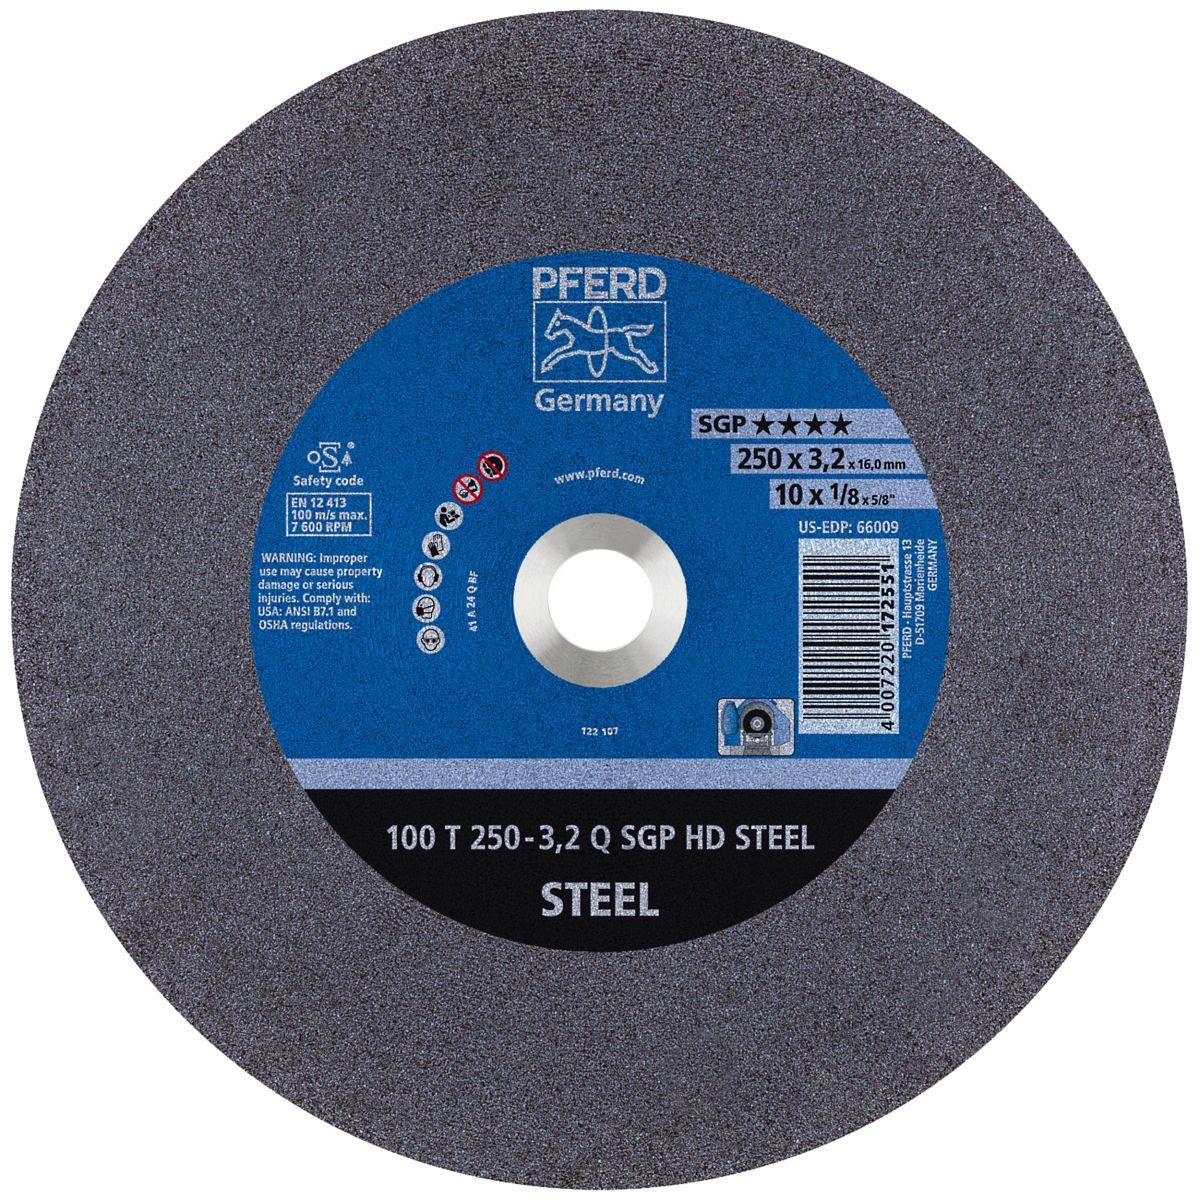 "10"" x 1/8"" x 5/8"" Type 1 Cut-Off Wheels for Ferrous Metals"